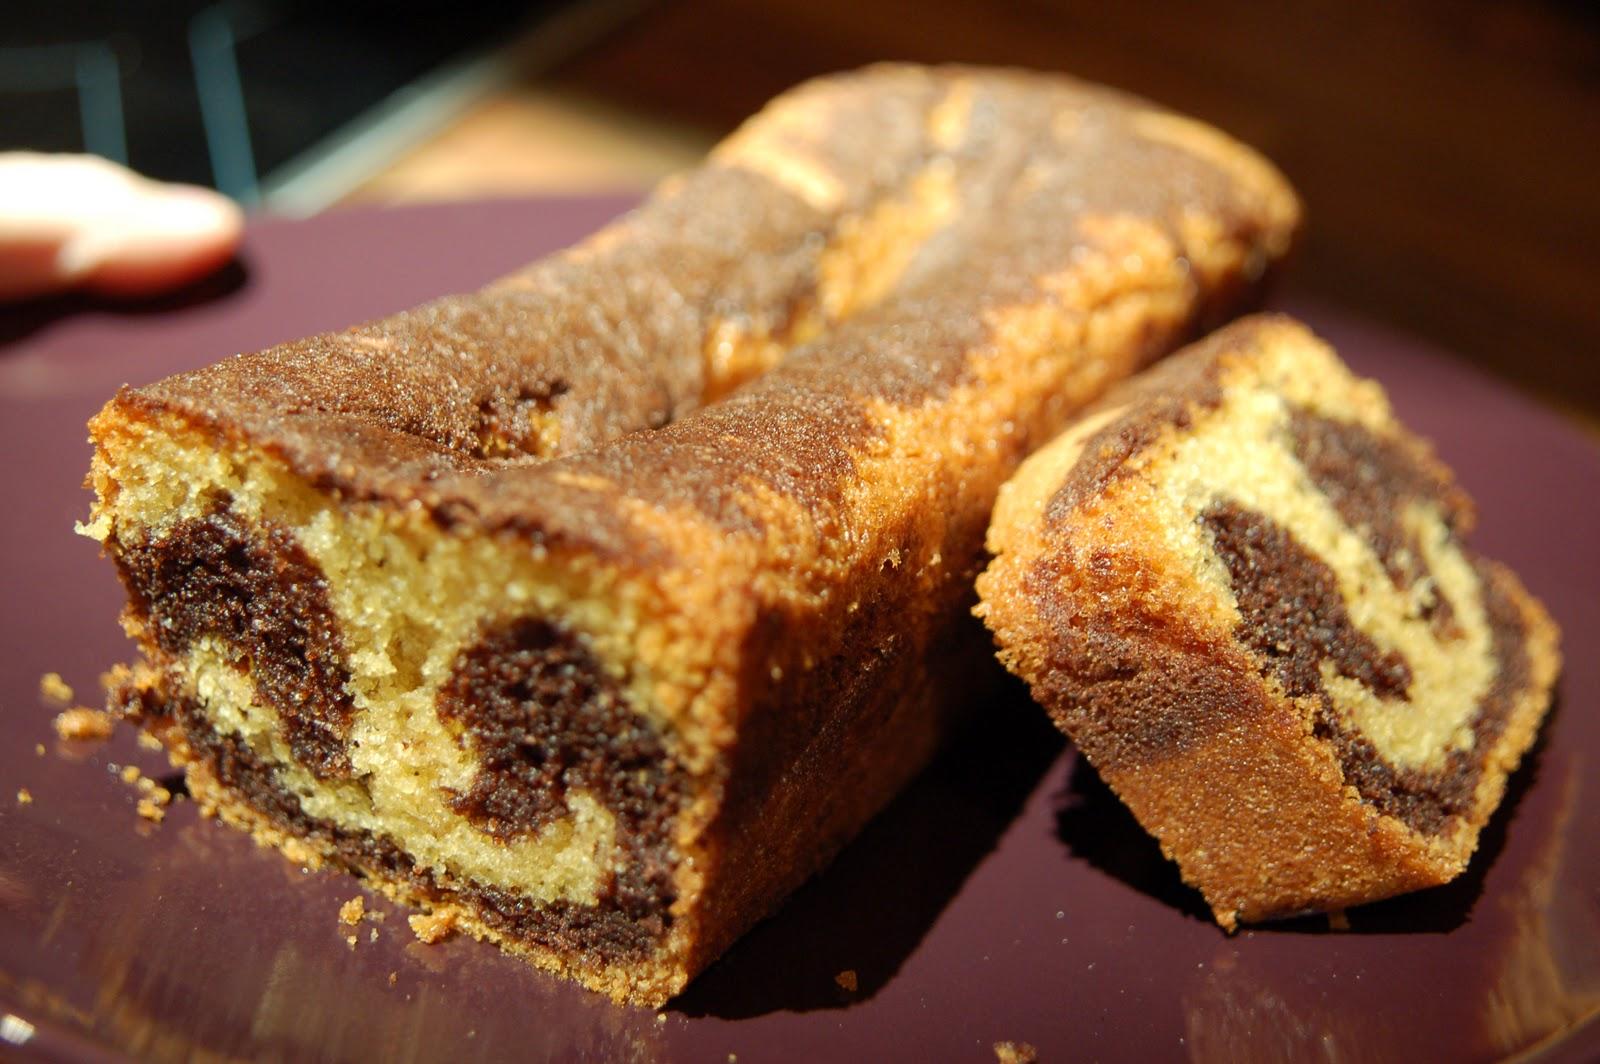 Croque en bouche le quatre quarts marbr vanille chocolat - Recette quatre quart marbre ...